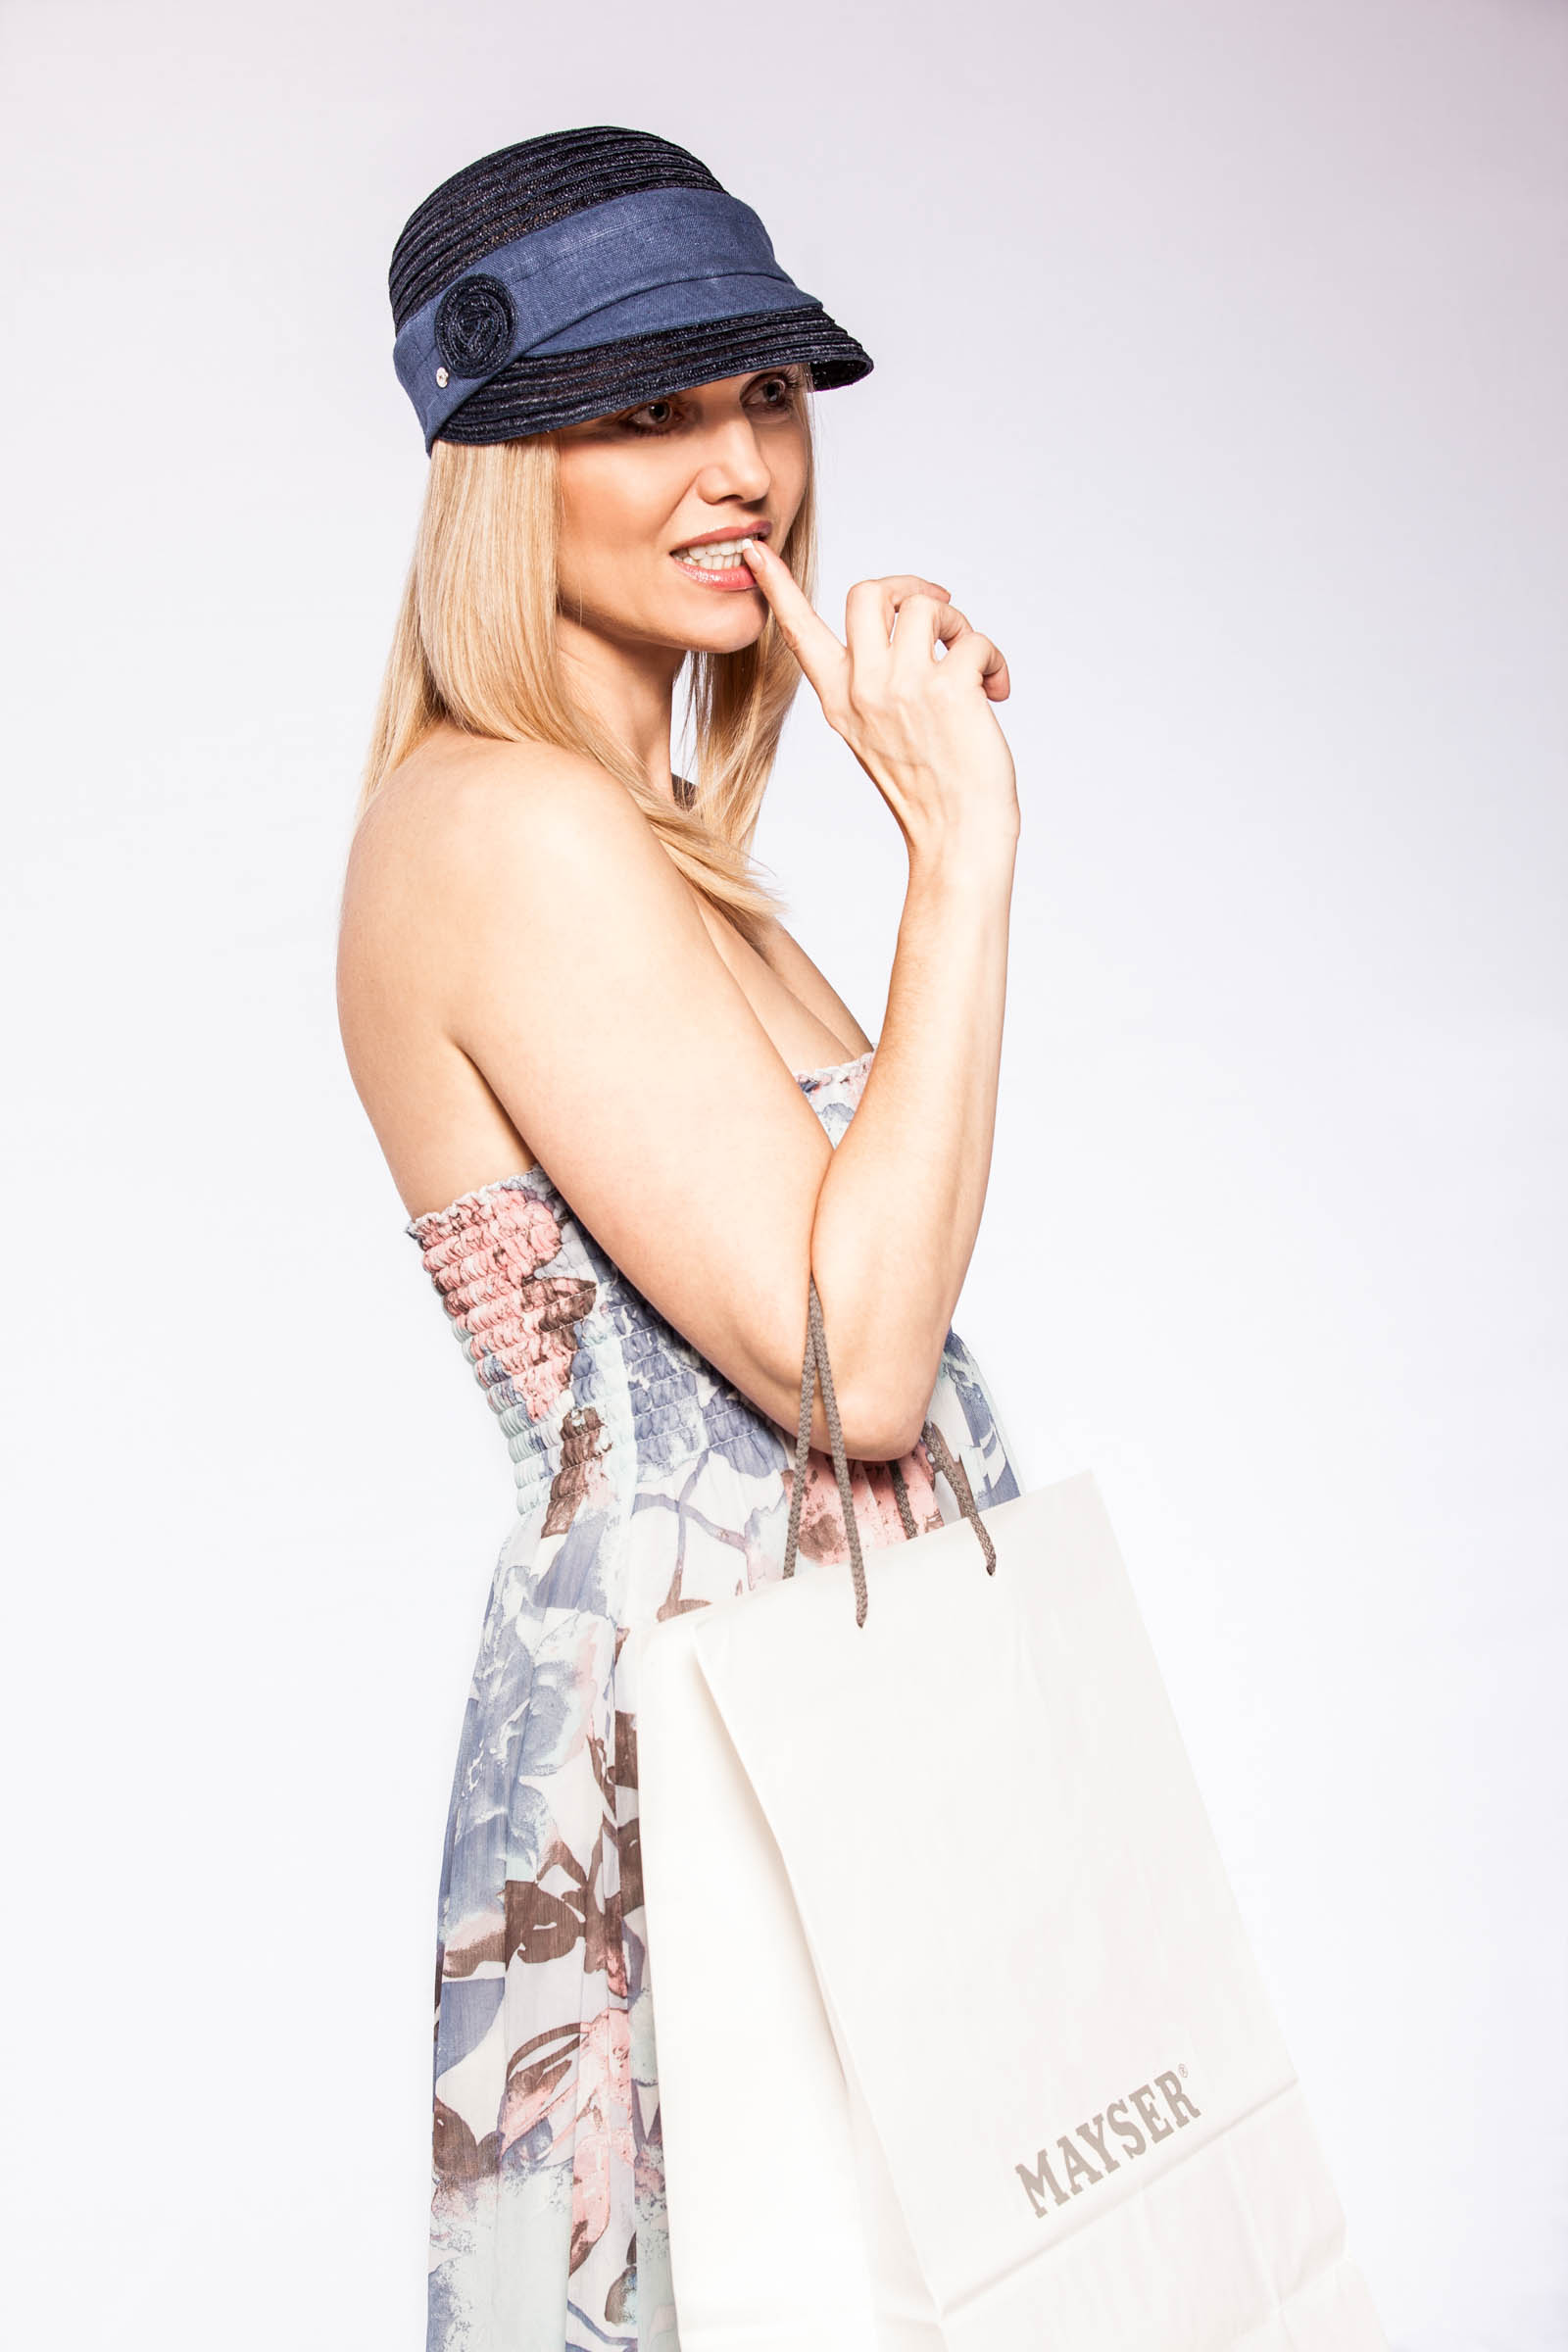 Mayser - reklamná fashion fotografia - pani v klobúku